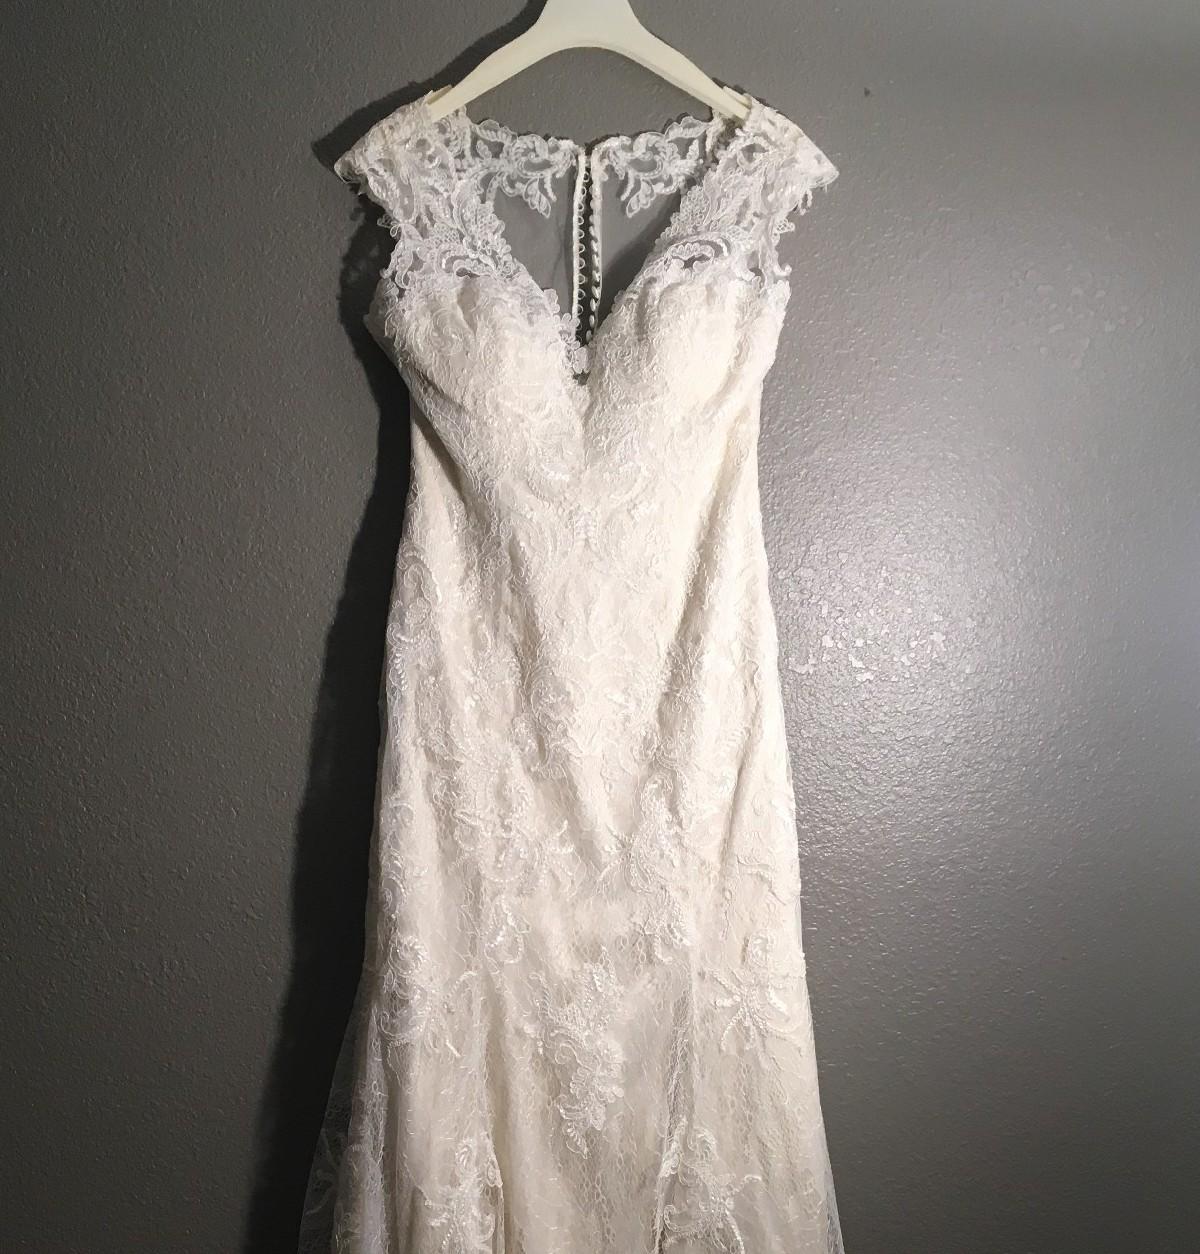 Maggie Sottero Tilda New Wedding Dress On Sale 67% Off